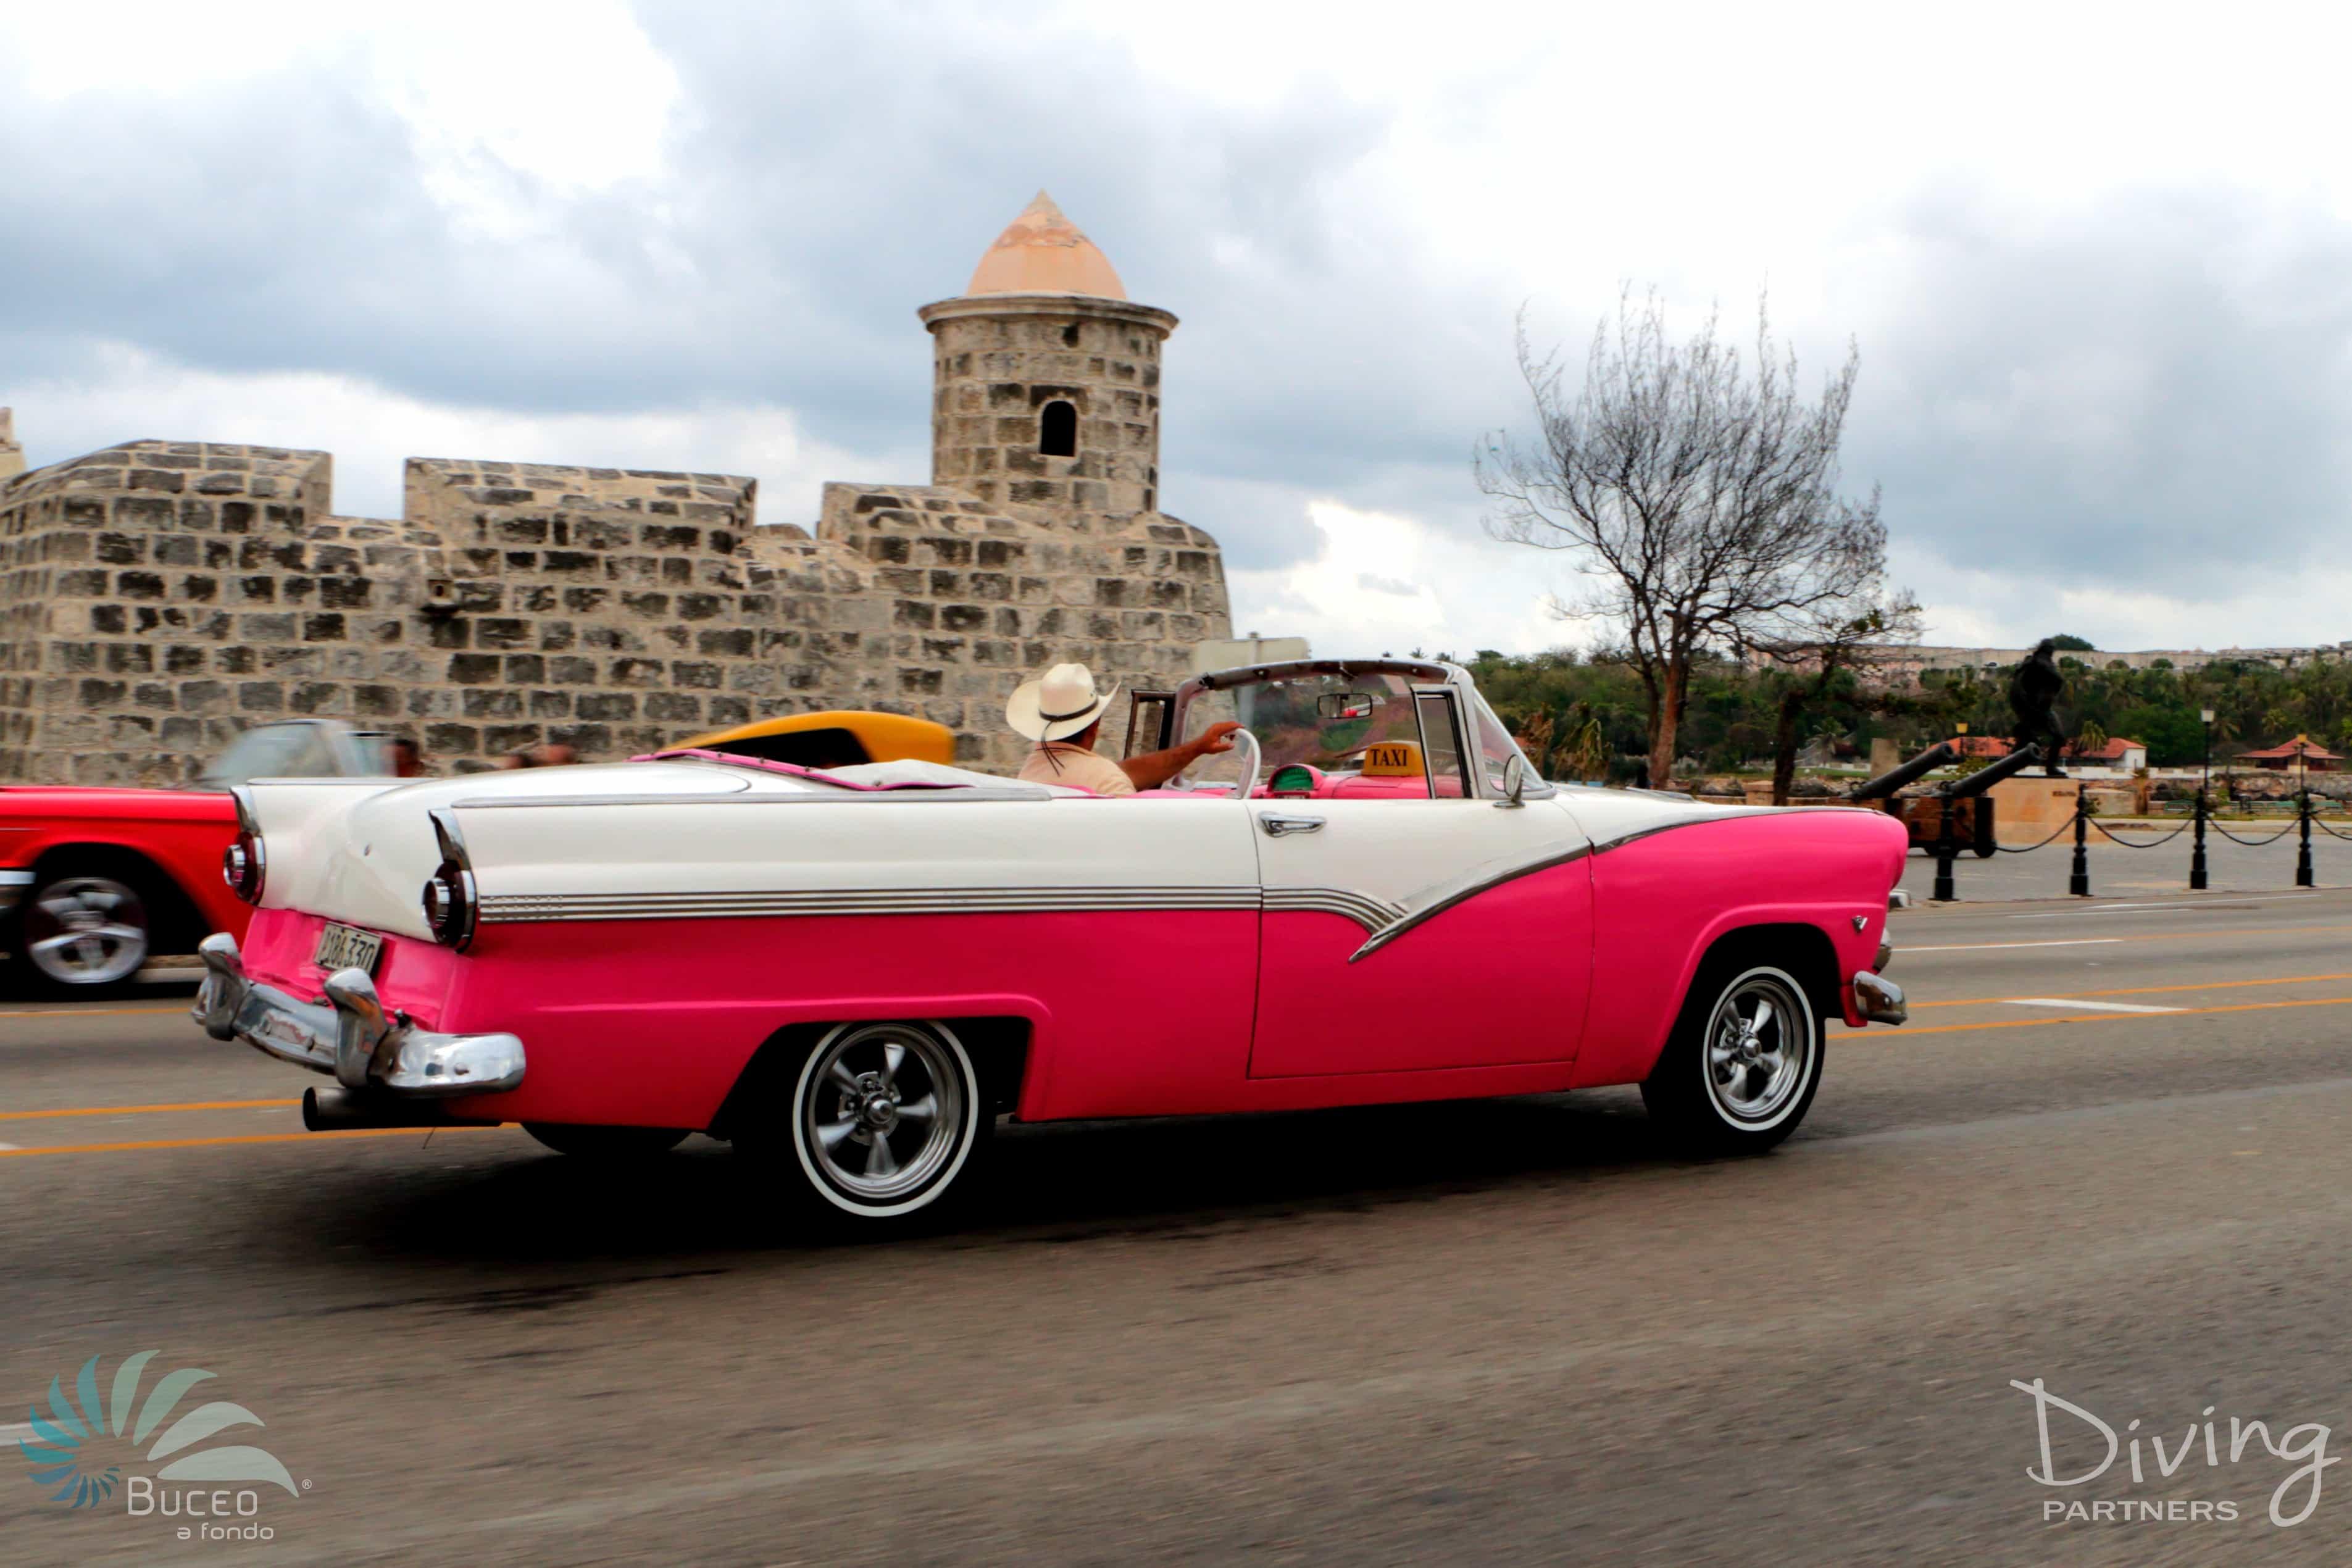 Diving Partners Cuba - La HabanaIMG_3473Azul